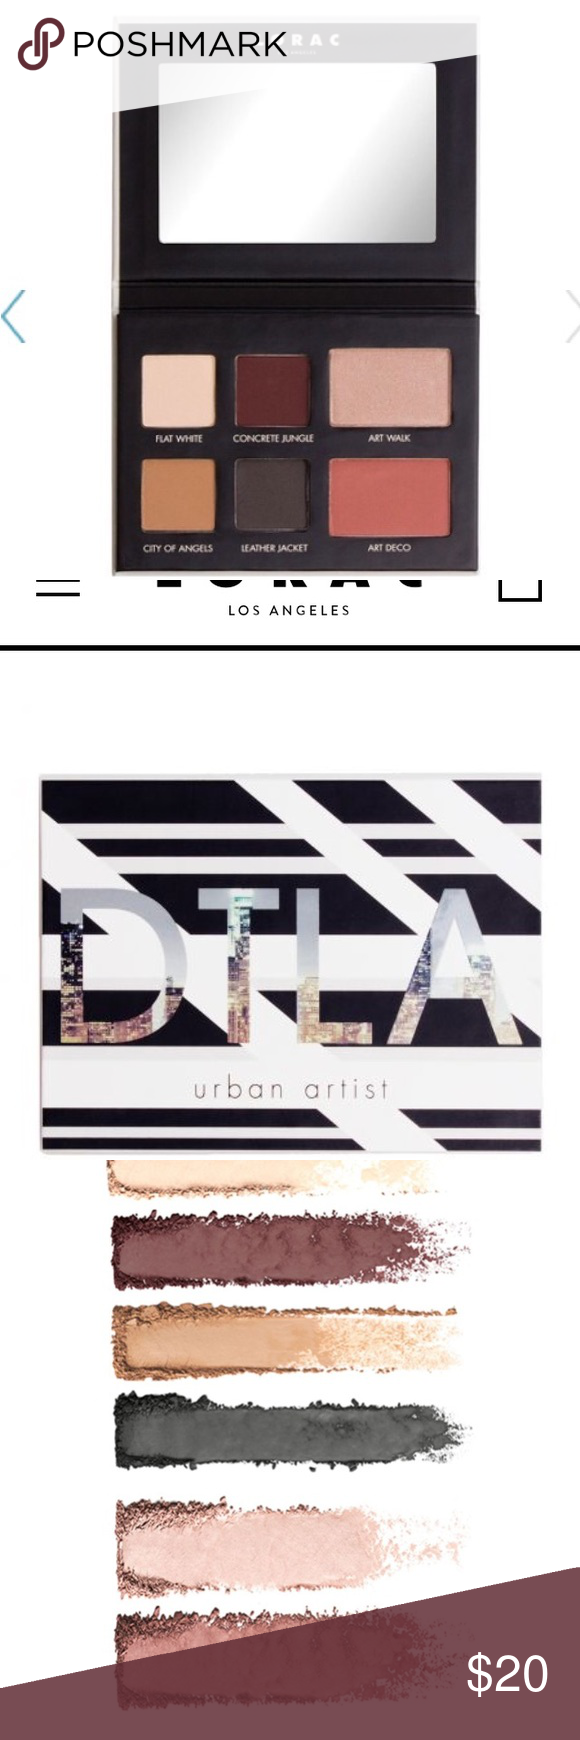 "LORAC Eye+Cheek Palette ""DTLA"" Urban Artist NWT (With"